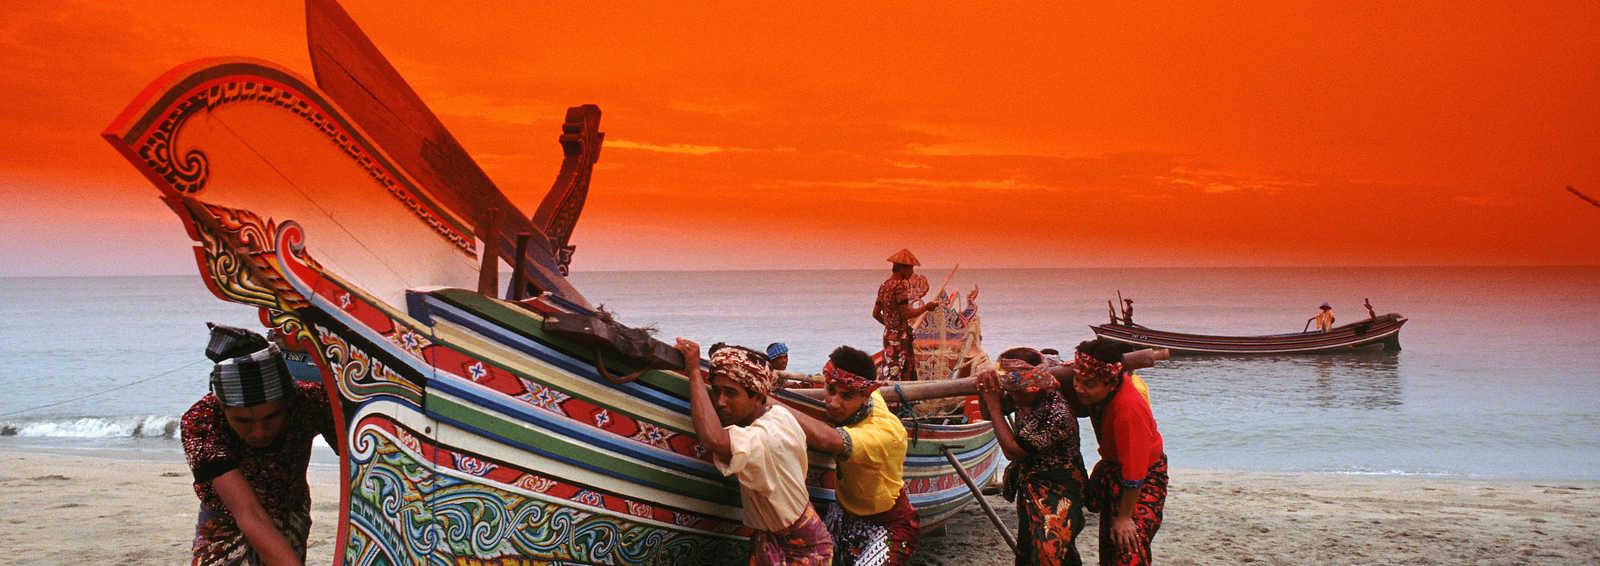 Traditional fishing boat, Malaysia